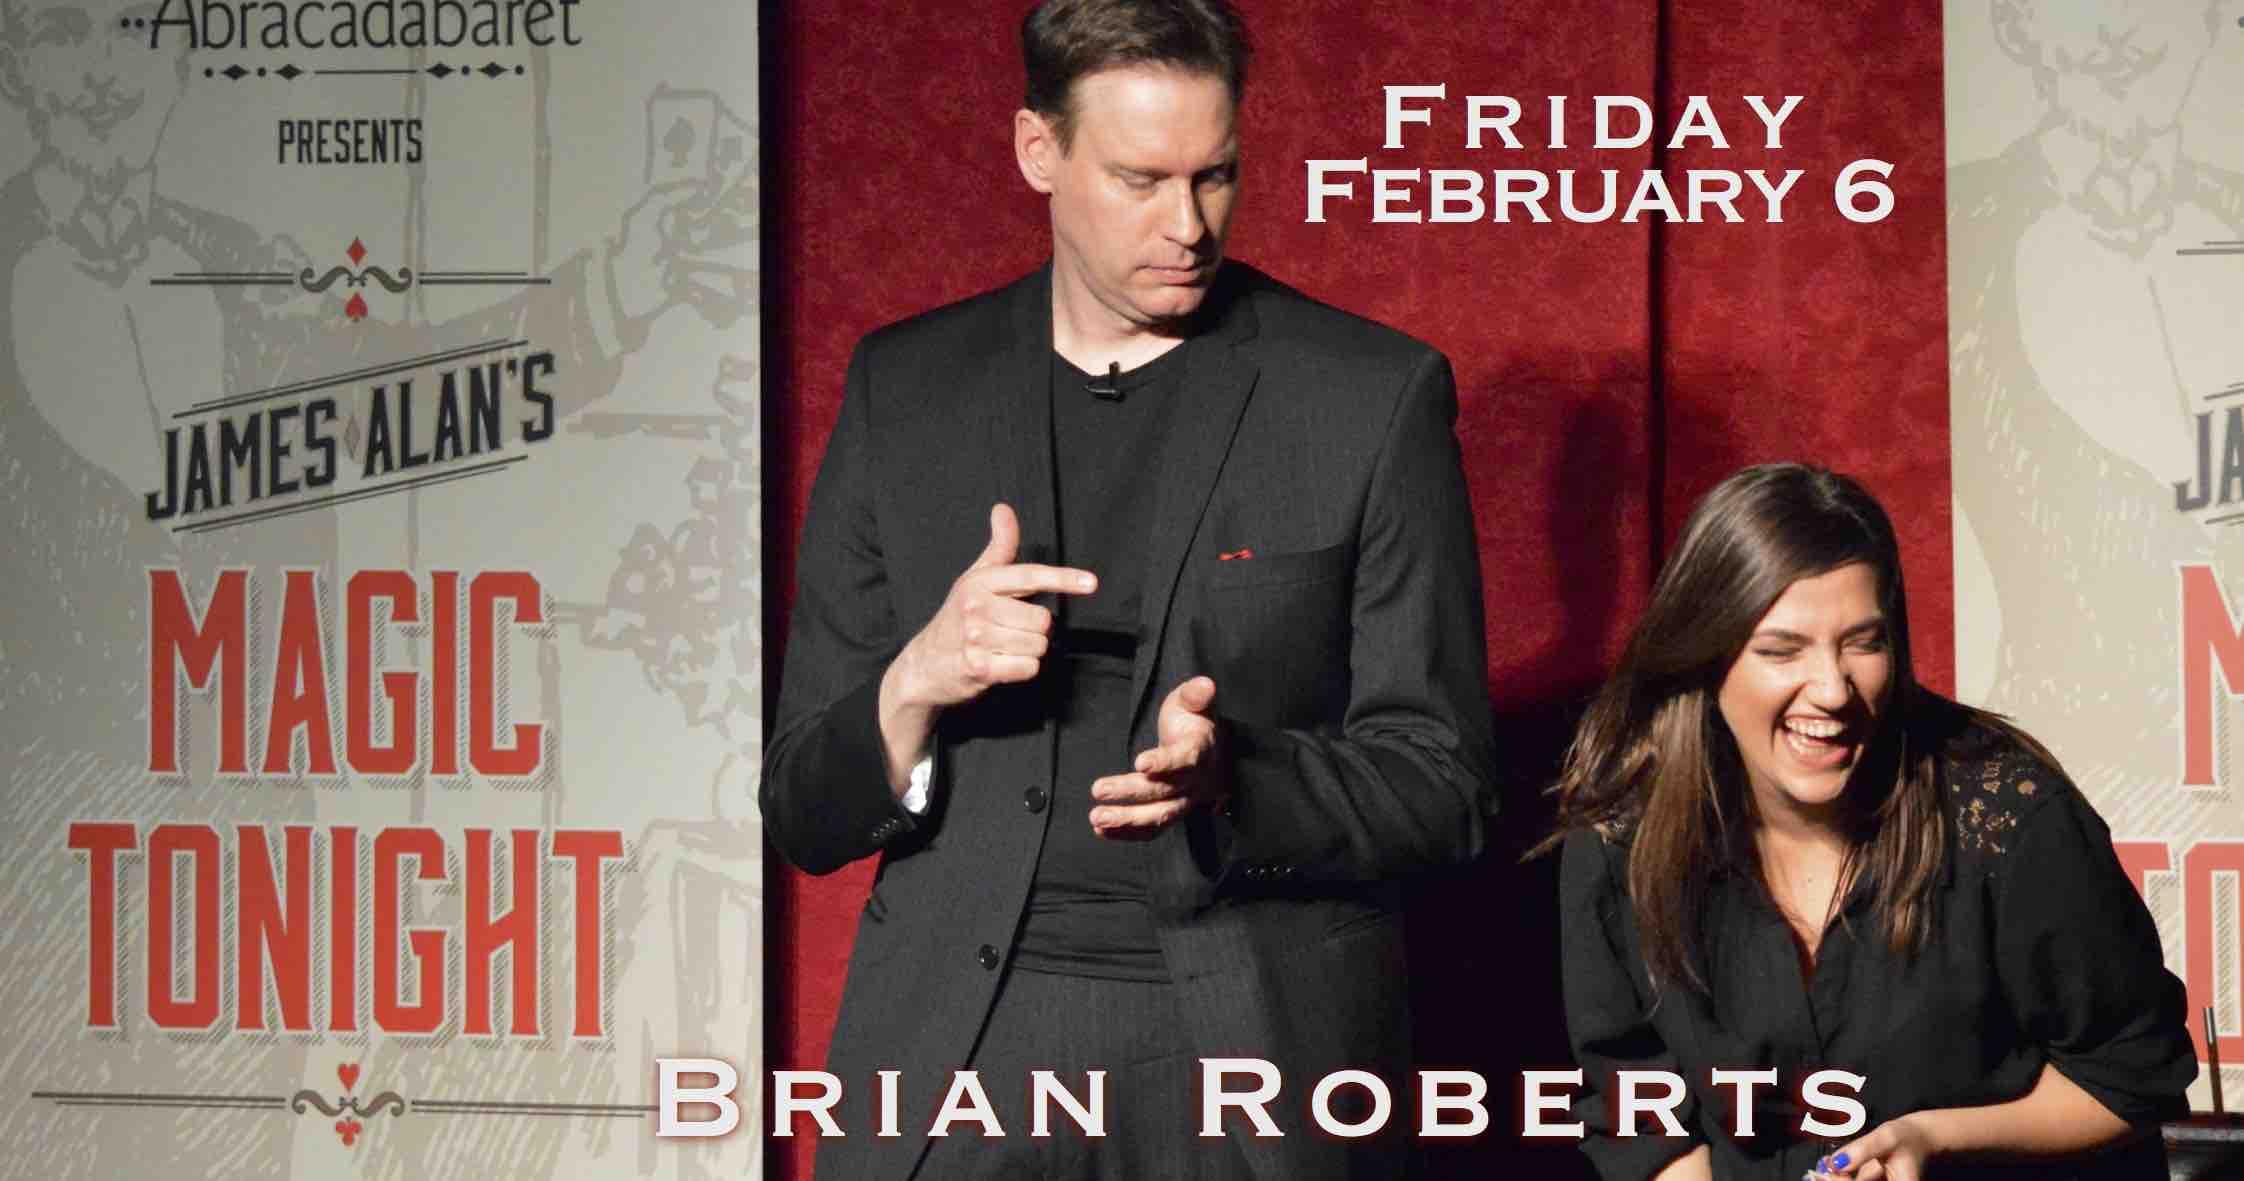 Feb 6 Roberts